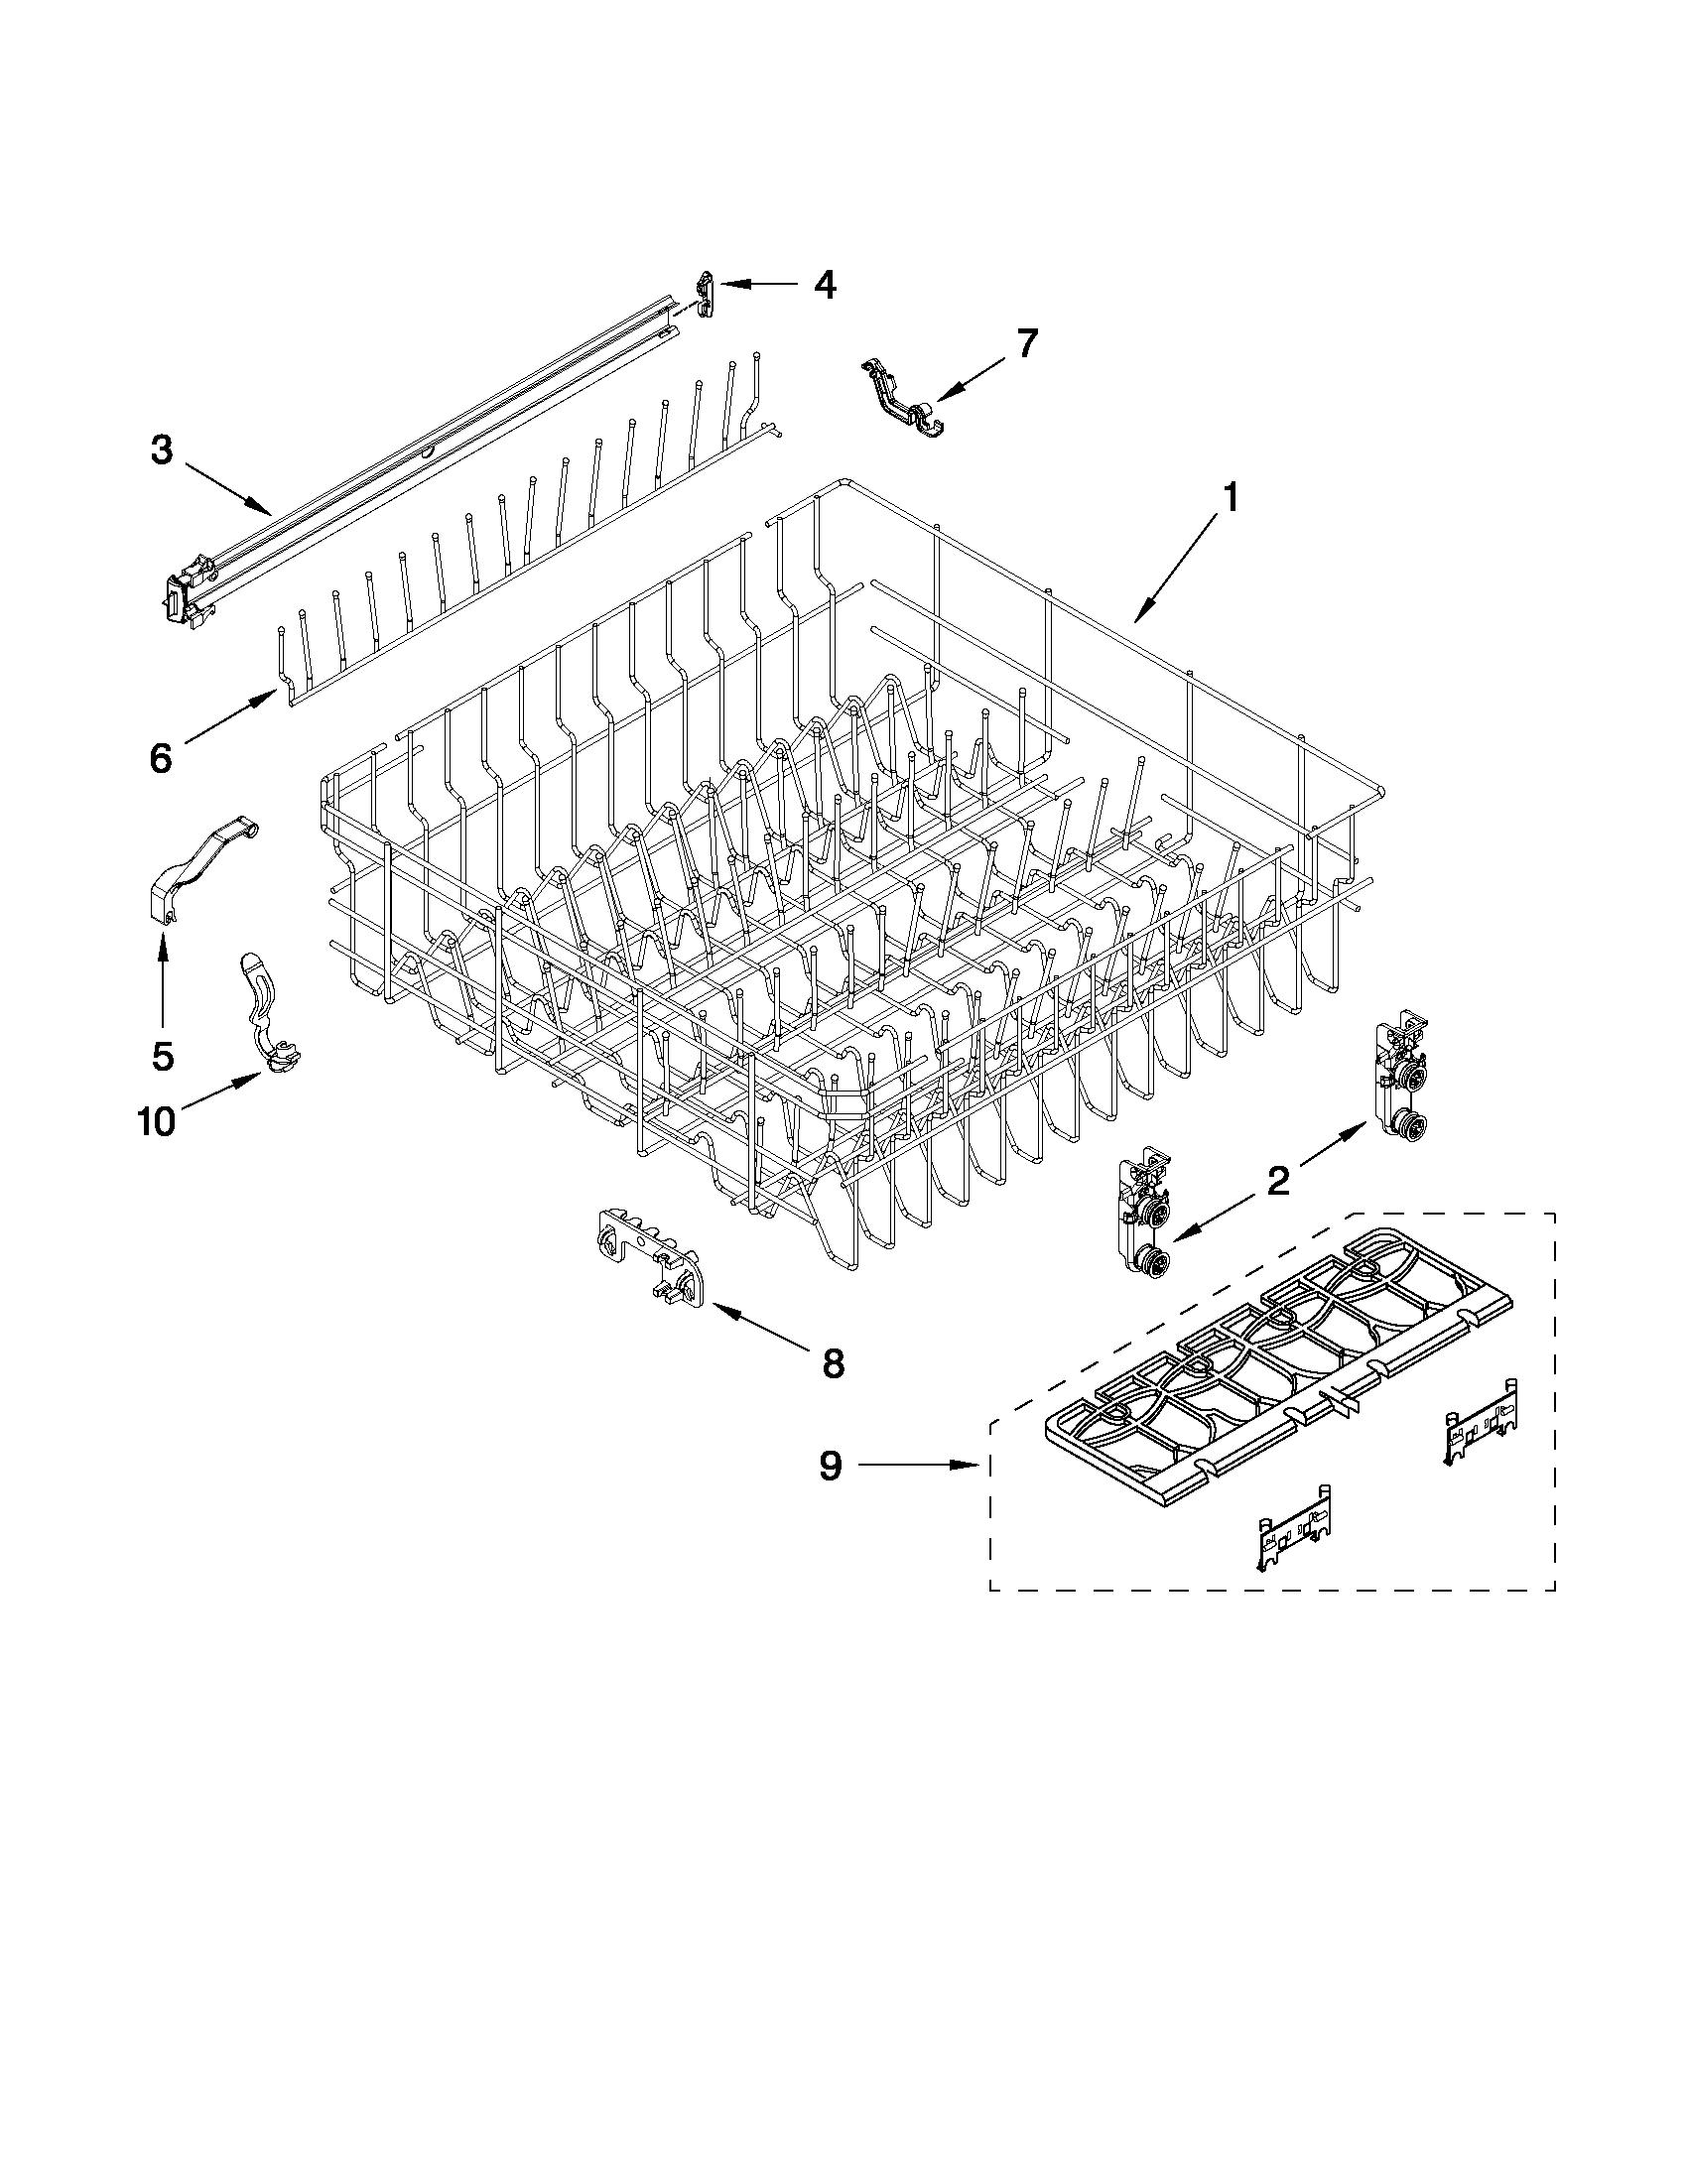 Whirlpool model WDT710PAYM3 dishwasher genuine parts